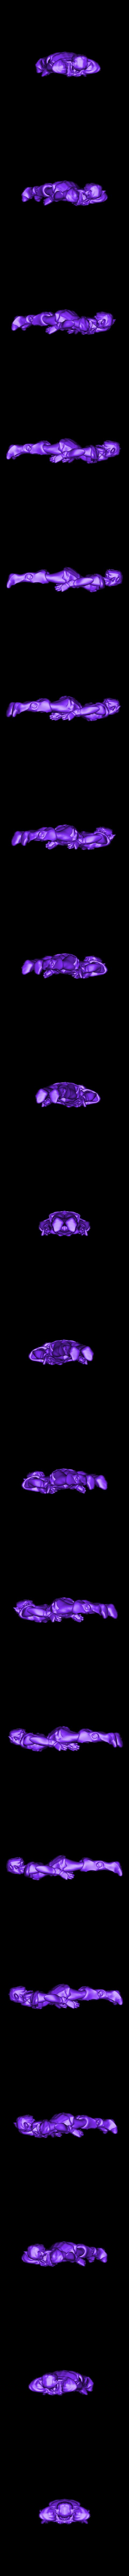 chevalier cygne.stl Download OBJ file 10 Intergalactic Humanoids • 3D print object, Majin59